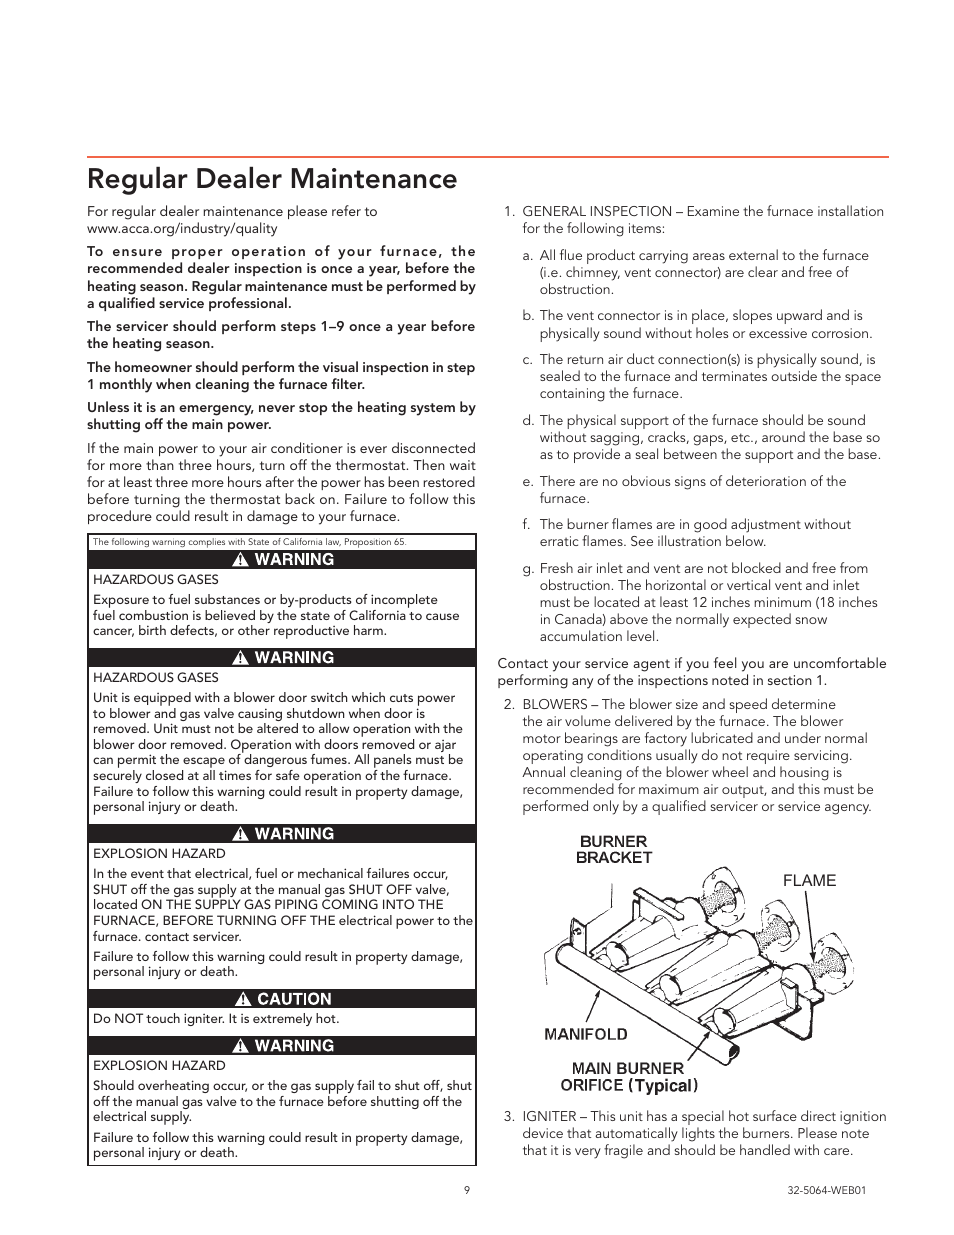 regular dealer maintenance trane xr80 user manual page 9 12 rh manualsdir com trane xr80 manual pdf trane xr80 furnace installation manual